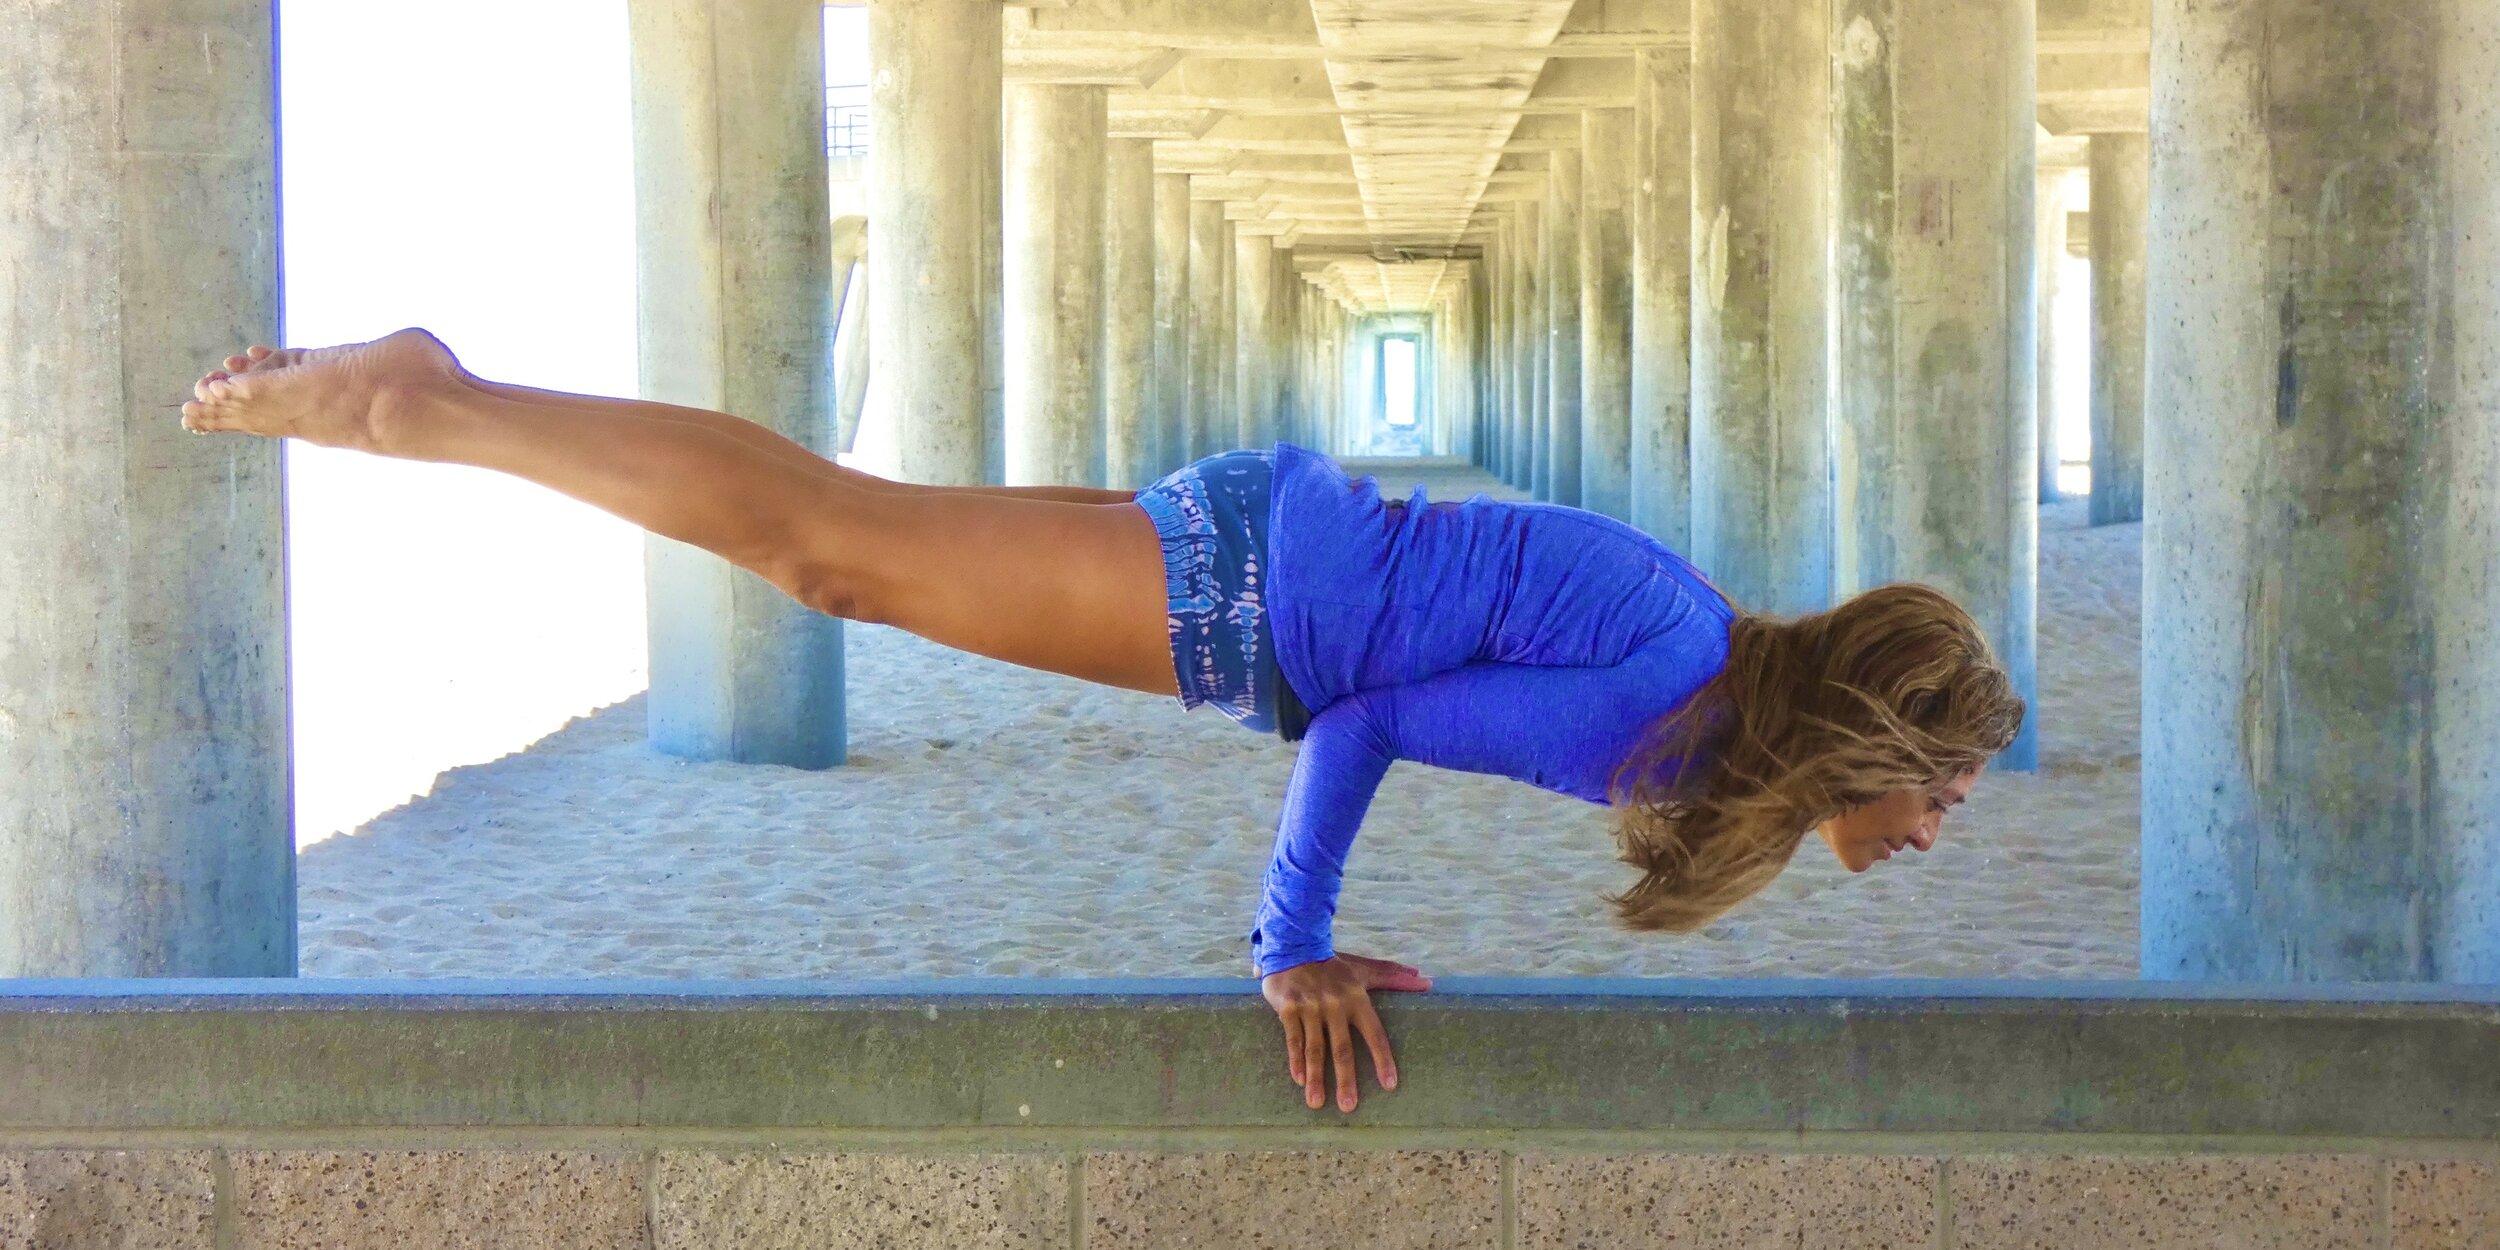 Yoga Classes Workshops Yoga Teacher Trainings Yoga Wellness Program Christina Martini Yoga Therapy Wellness